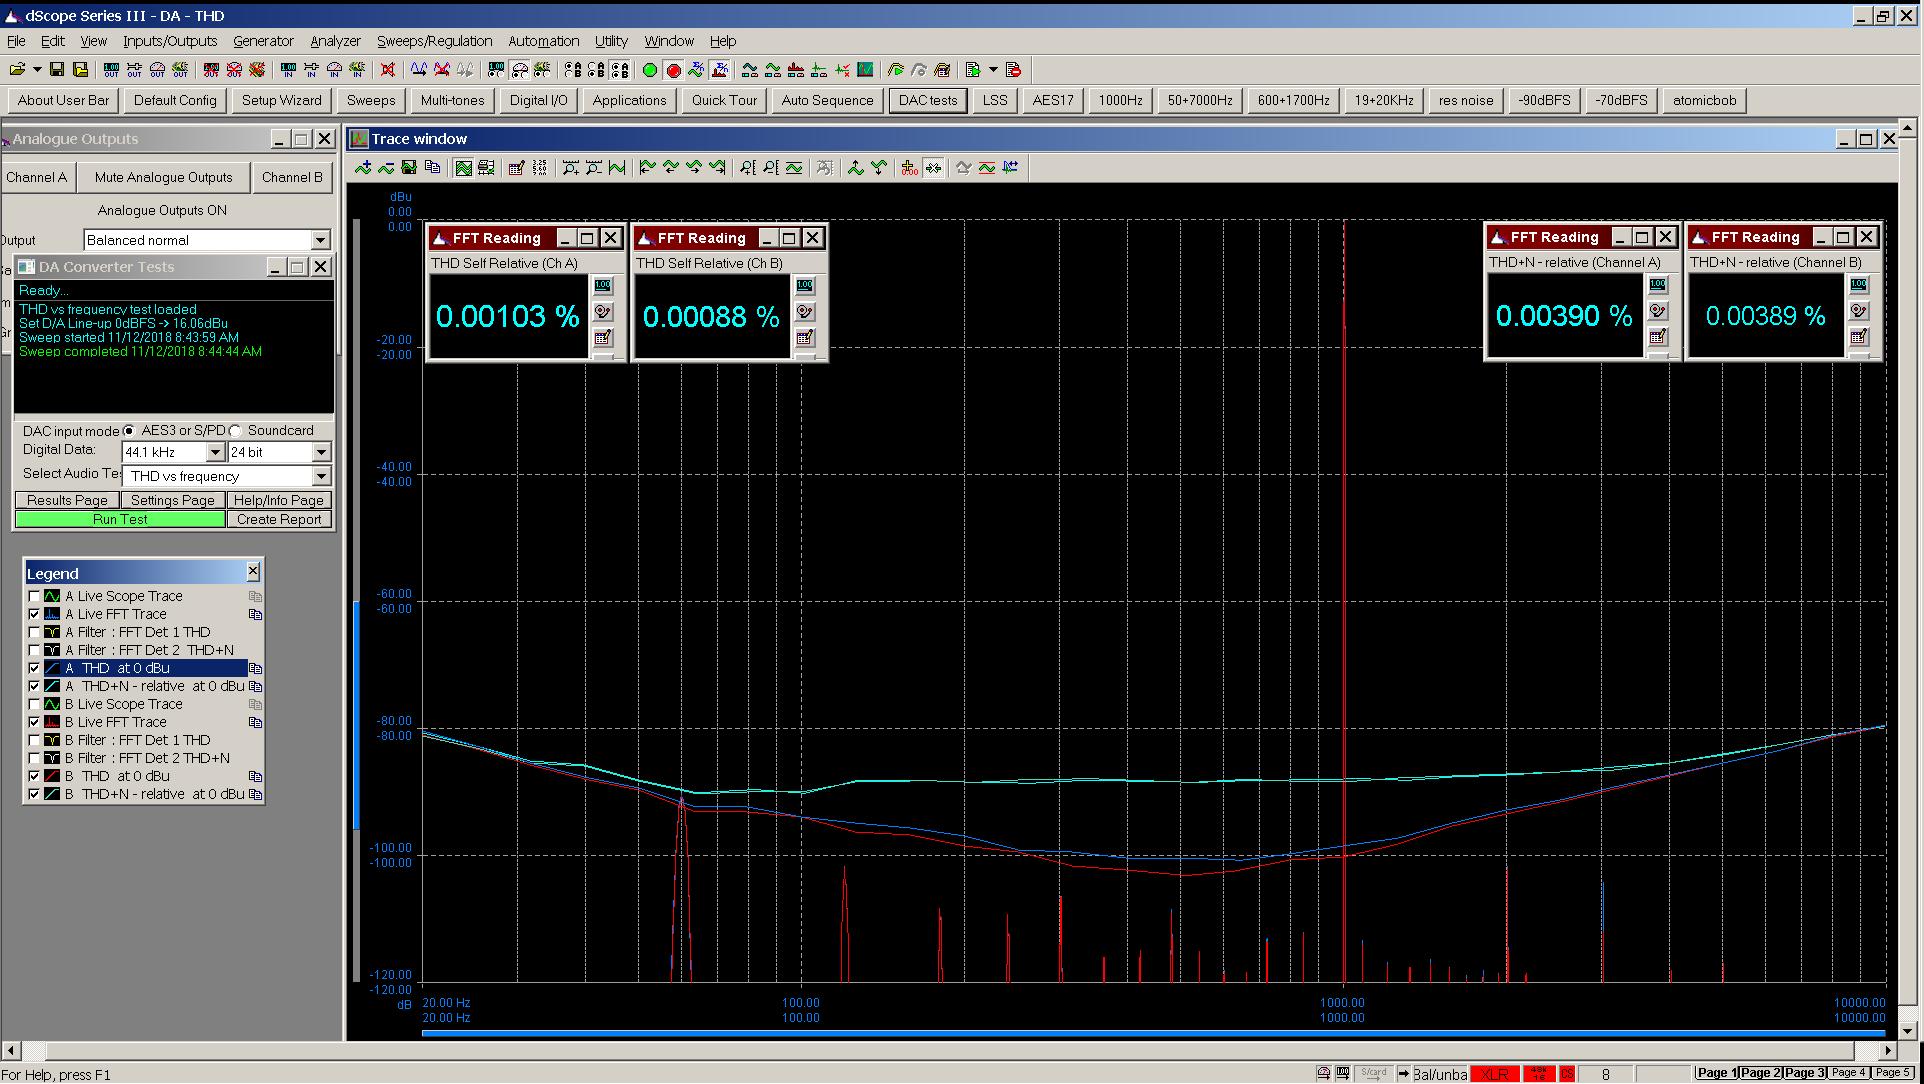 20181110-11 LiqPlat THD THD+N vs Freq 30R SE-4XF - NoiseNuke.png